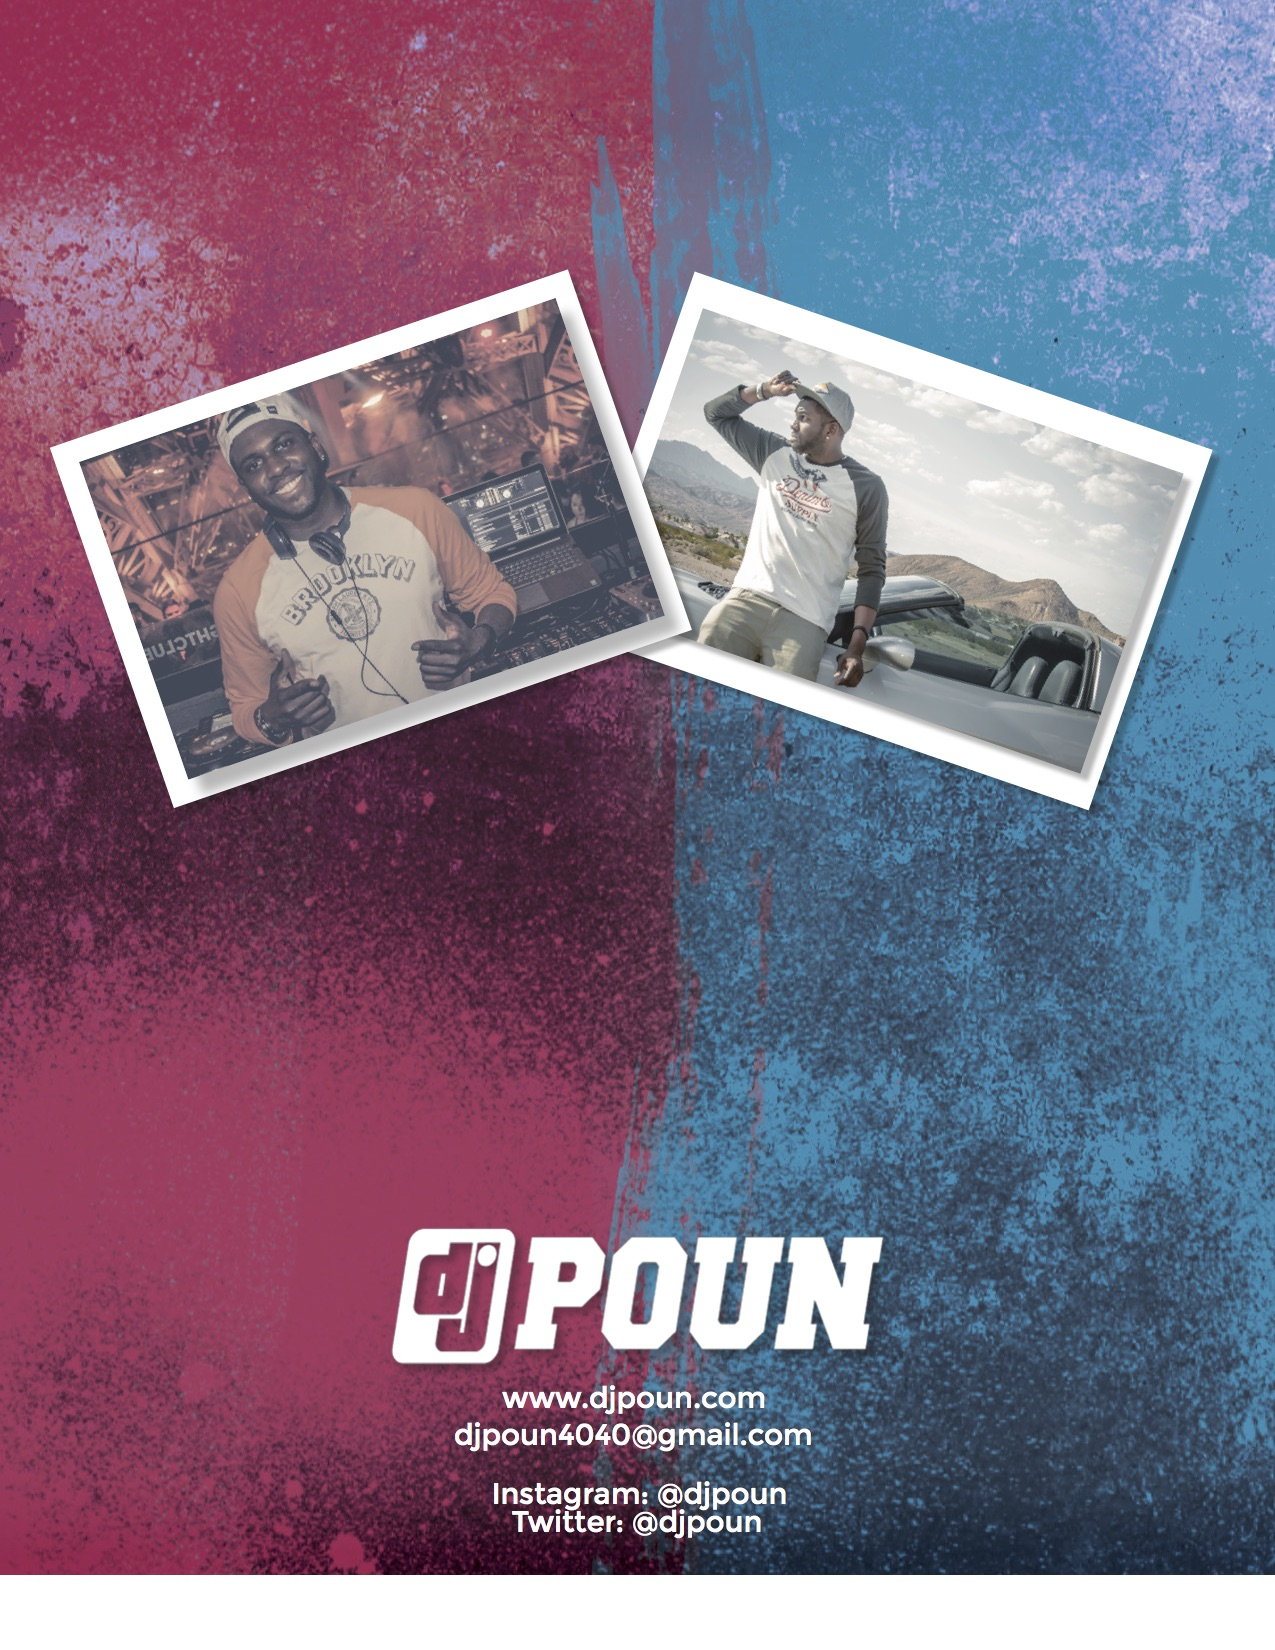 DJ Poun EPK image 4